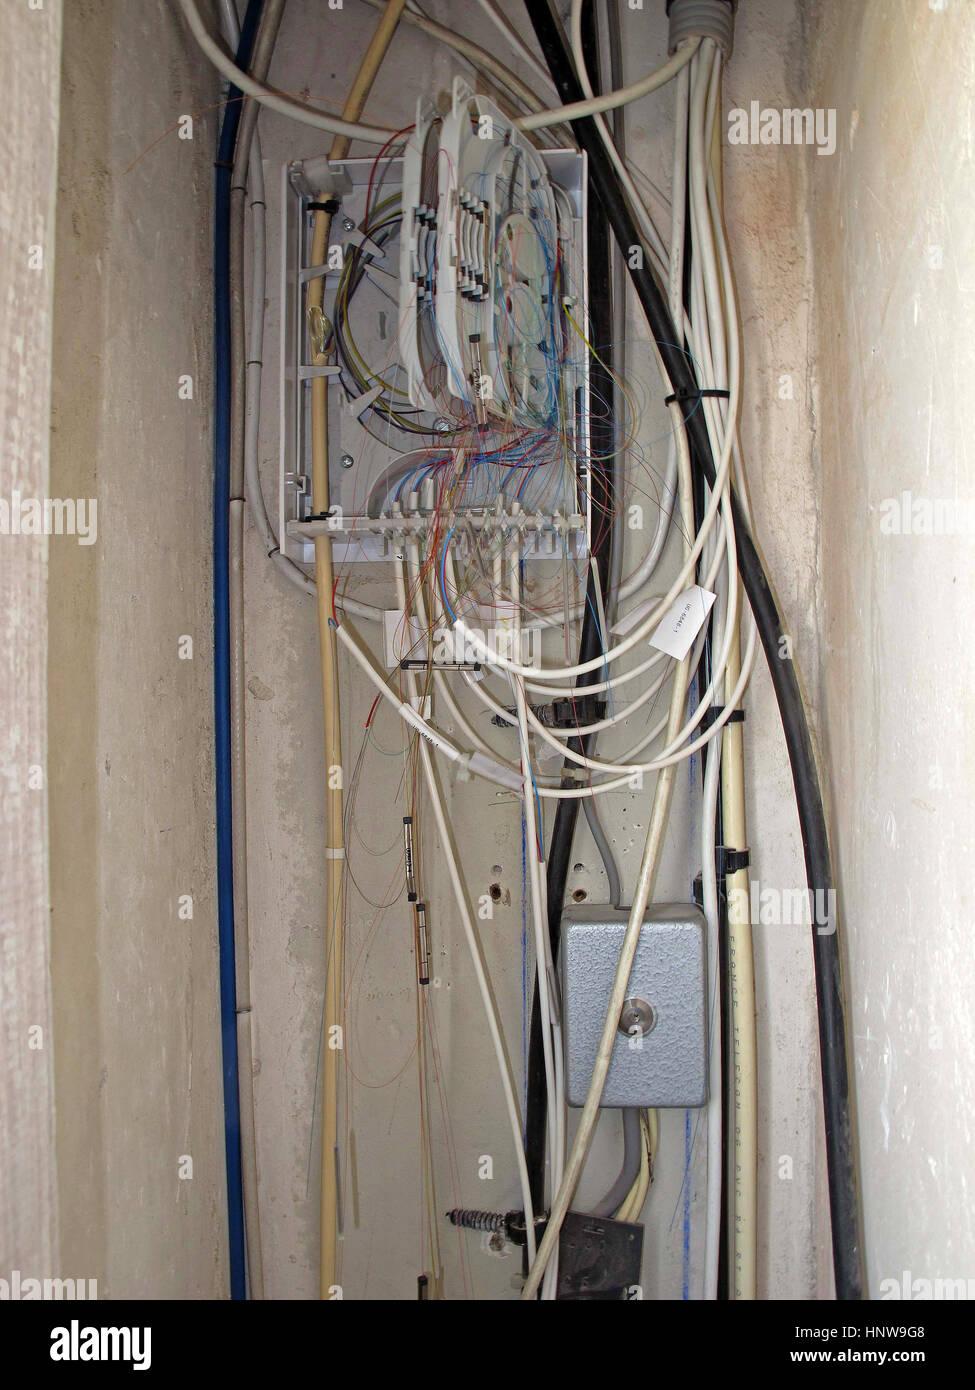 medium resolution of optical fiber cable junction box hi tech internet television phone paris france europe